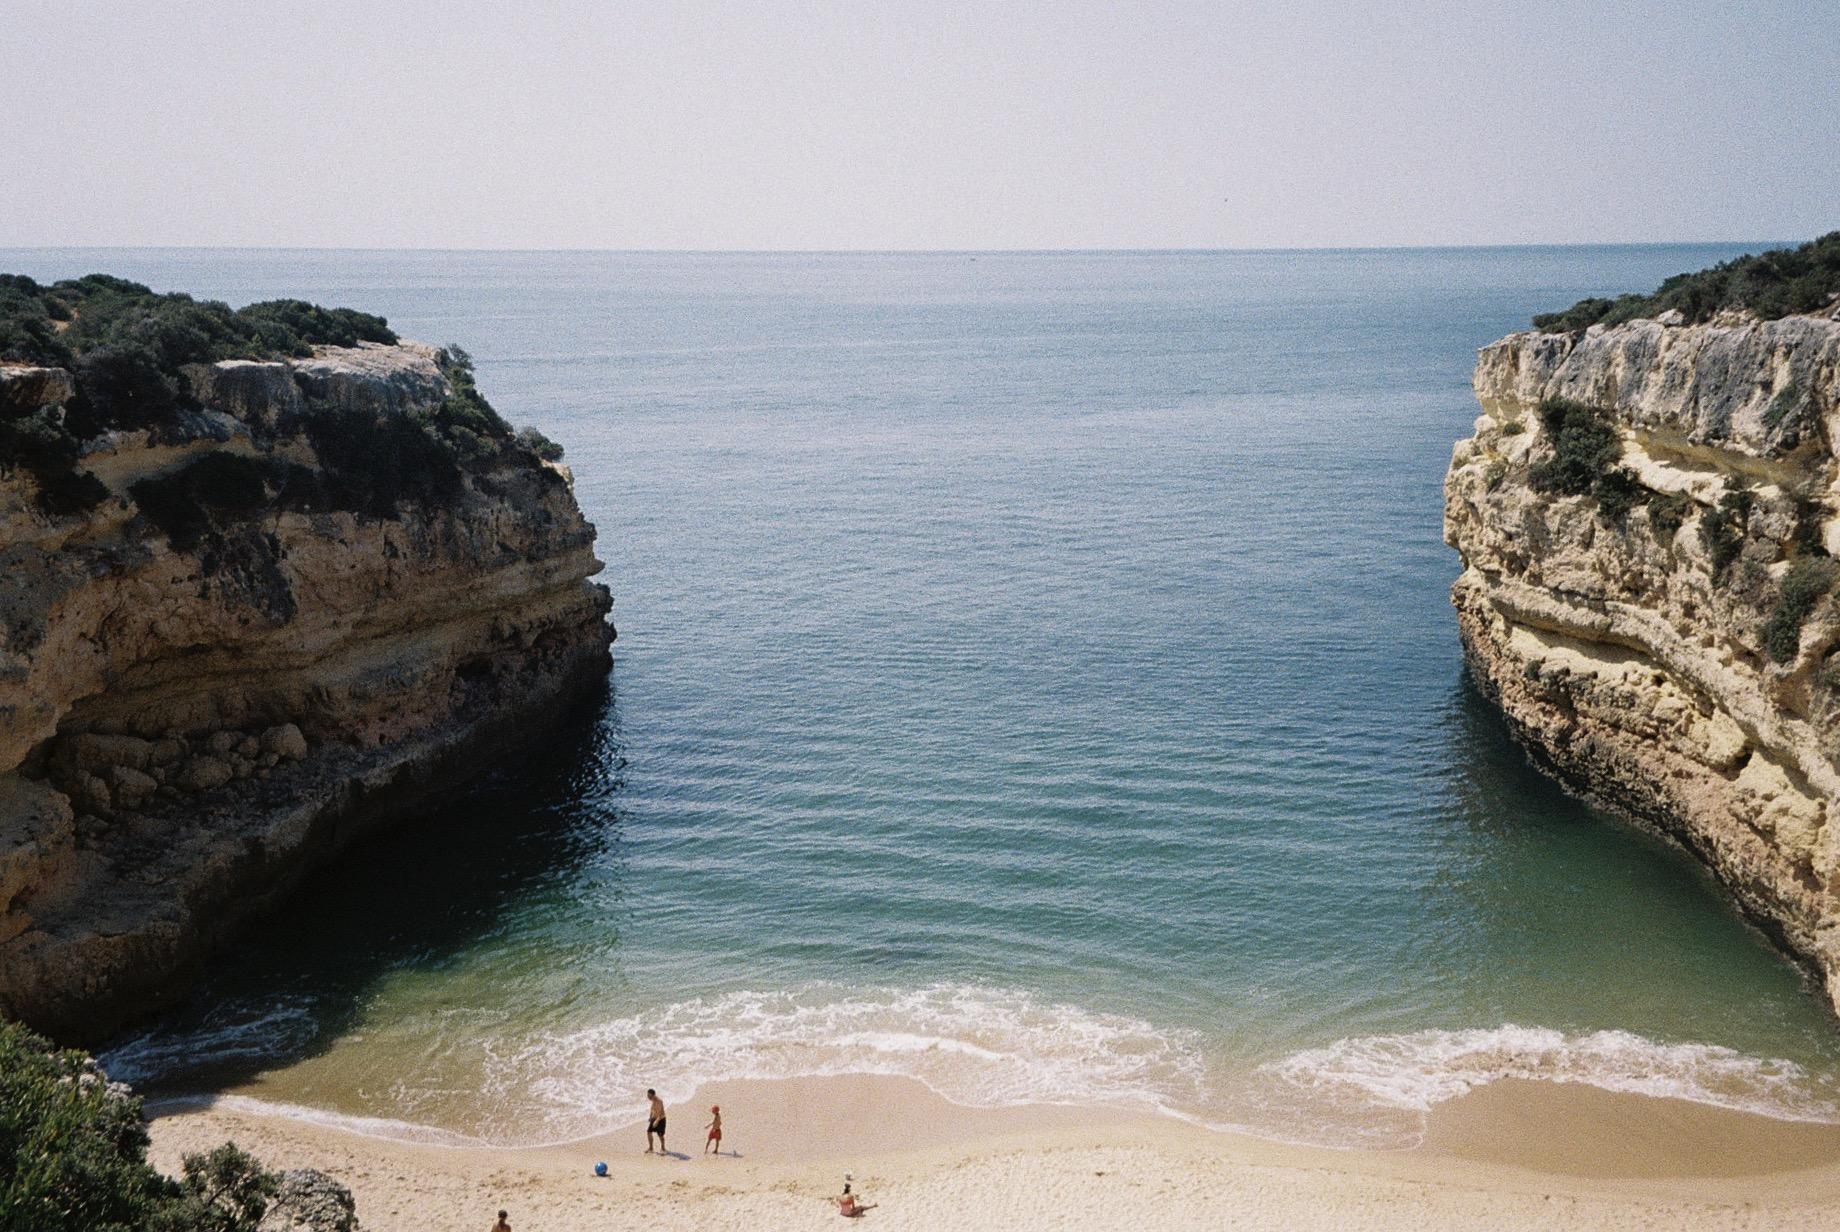 My secret beach in the Algarve.  / A minha praia secreta no Algarve.